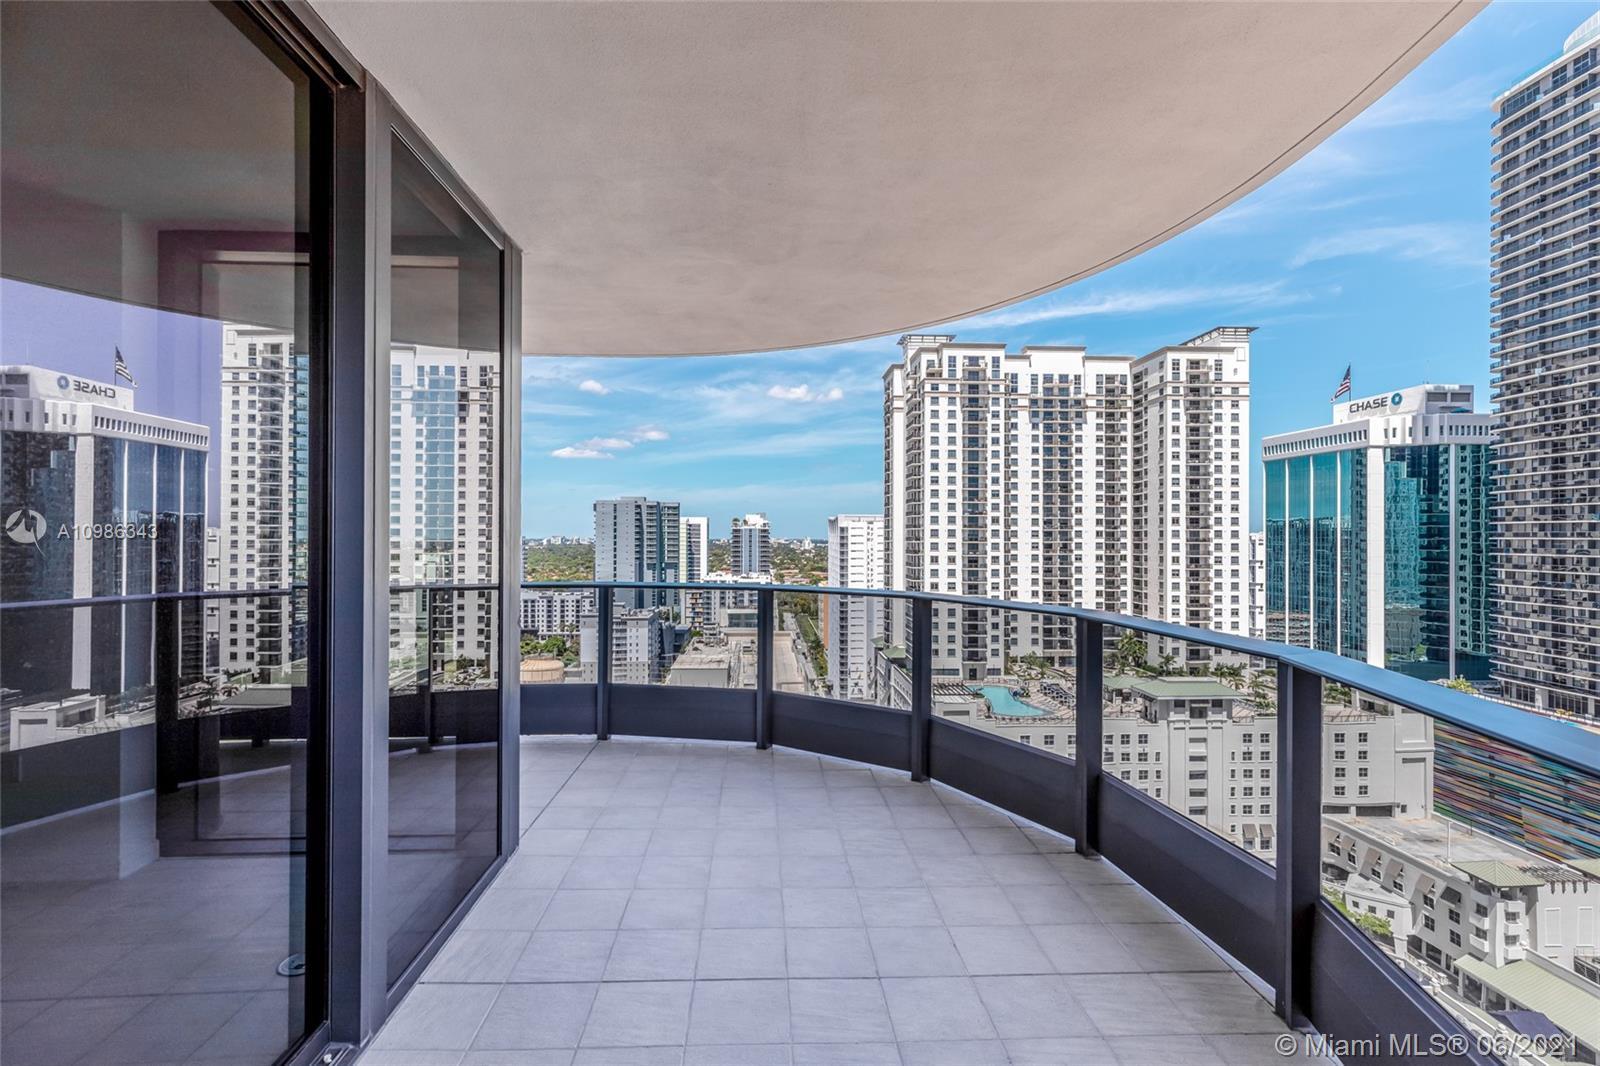 Brickell FlatIron #2212 - 1000 Brickell Plz #2212, Miami, FL 33131